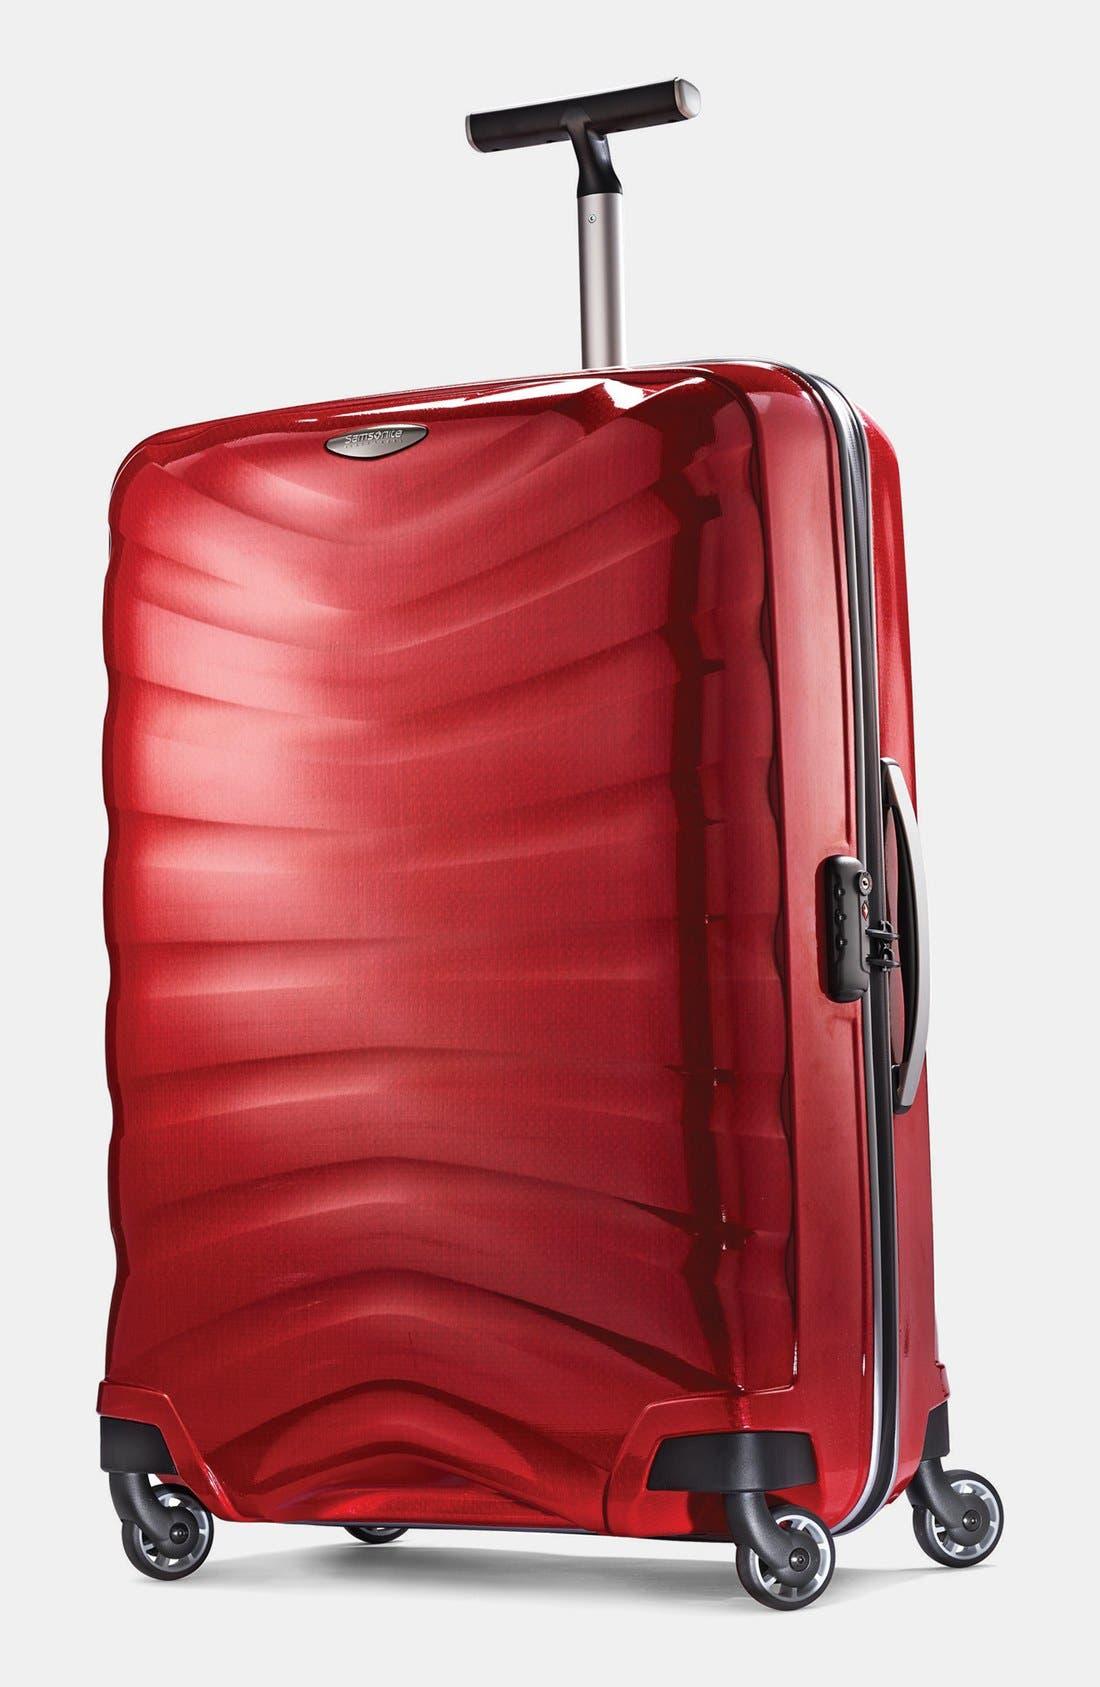 Main Image - Samsonite 'Firelite' Rolling Suitcase (28 Inch)